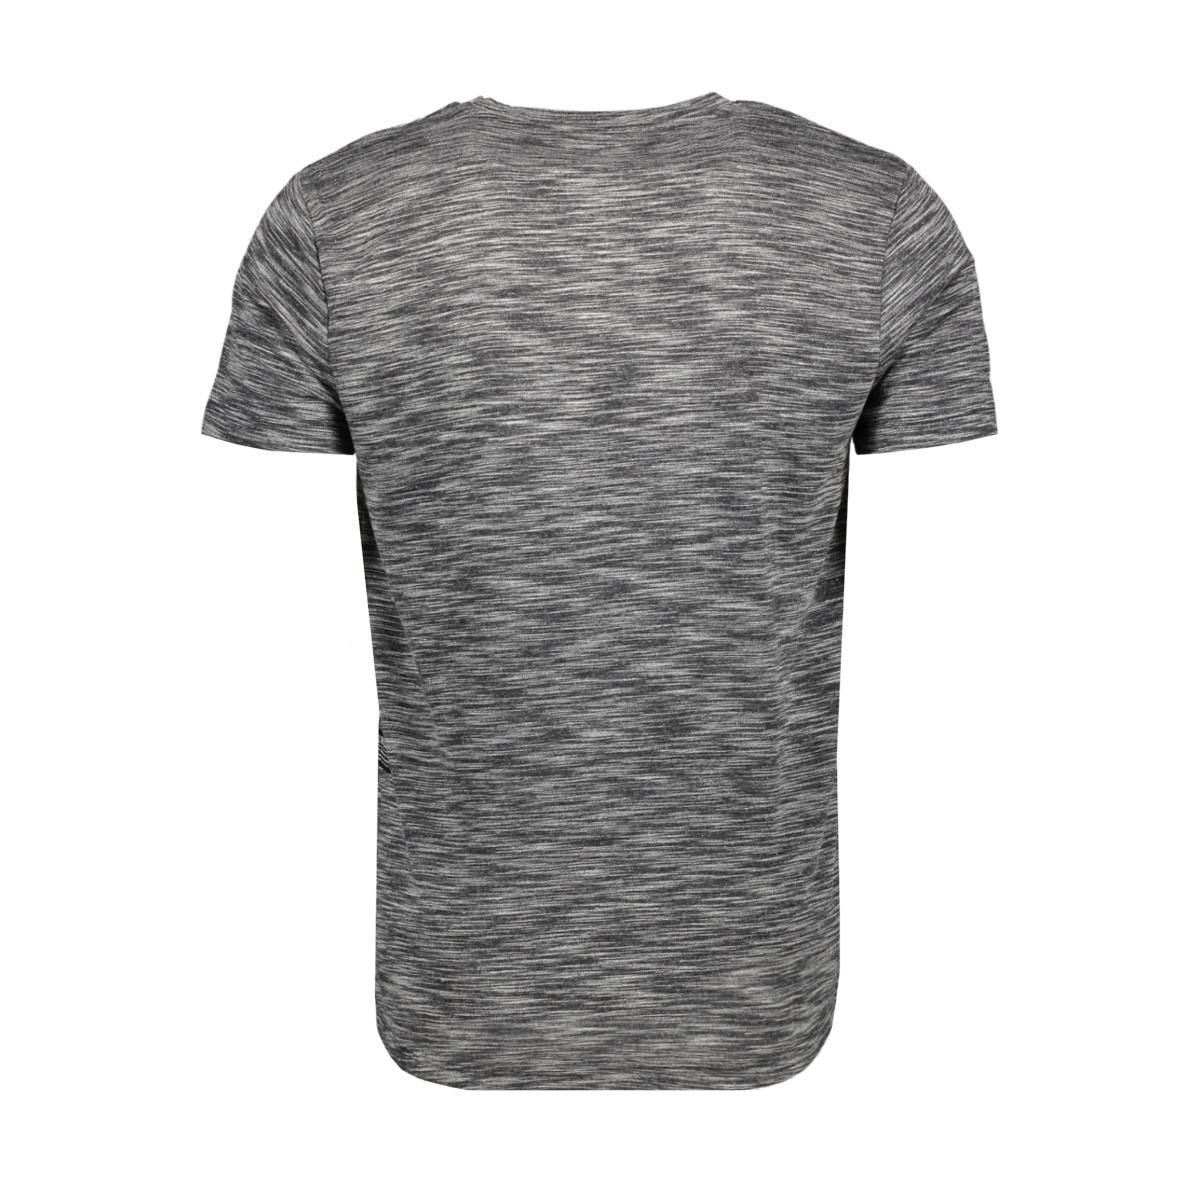 gemeleerd t shirt met borstzak 1011974xx12 tom tailor t-shirt 15934